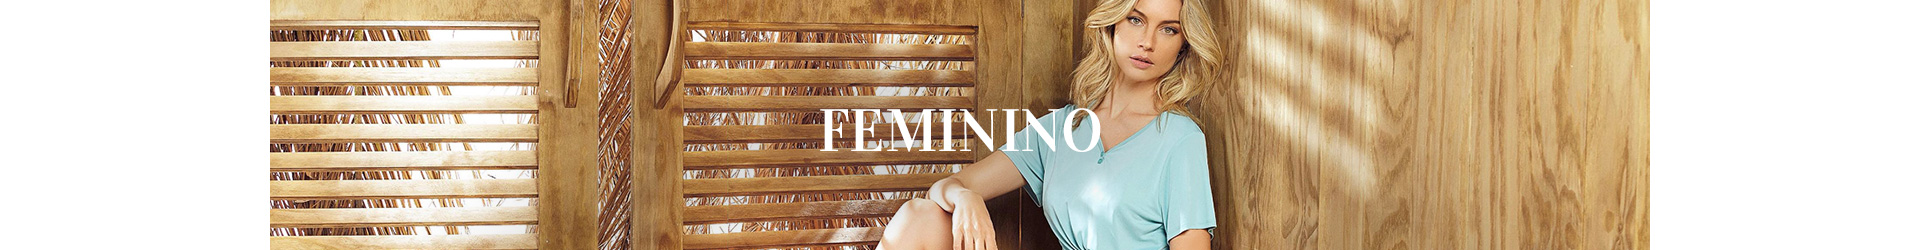 Banner Principal - Feminino